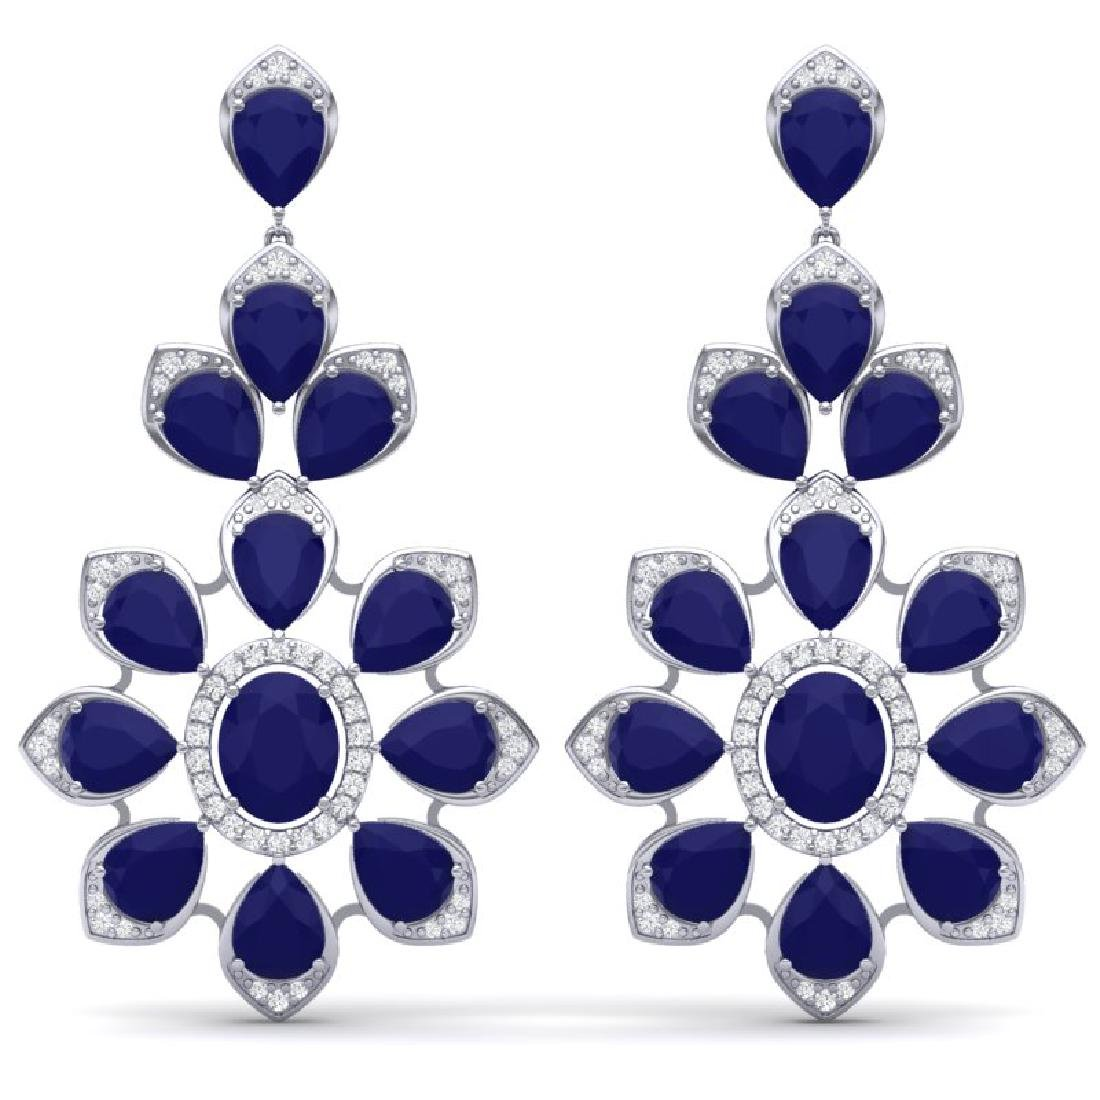 51.8 CTW Royalty Sapphire & VS Diamond Earrings 18K